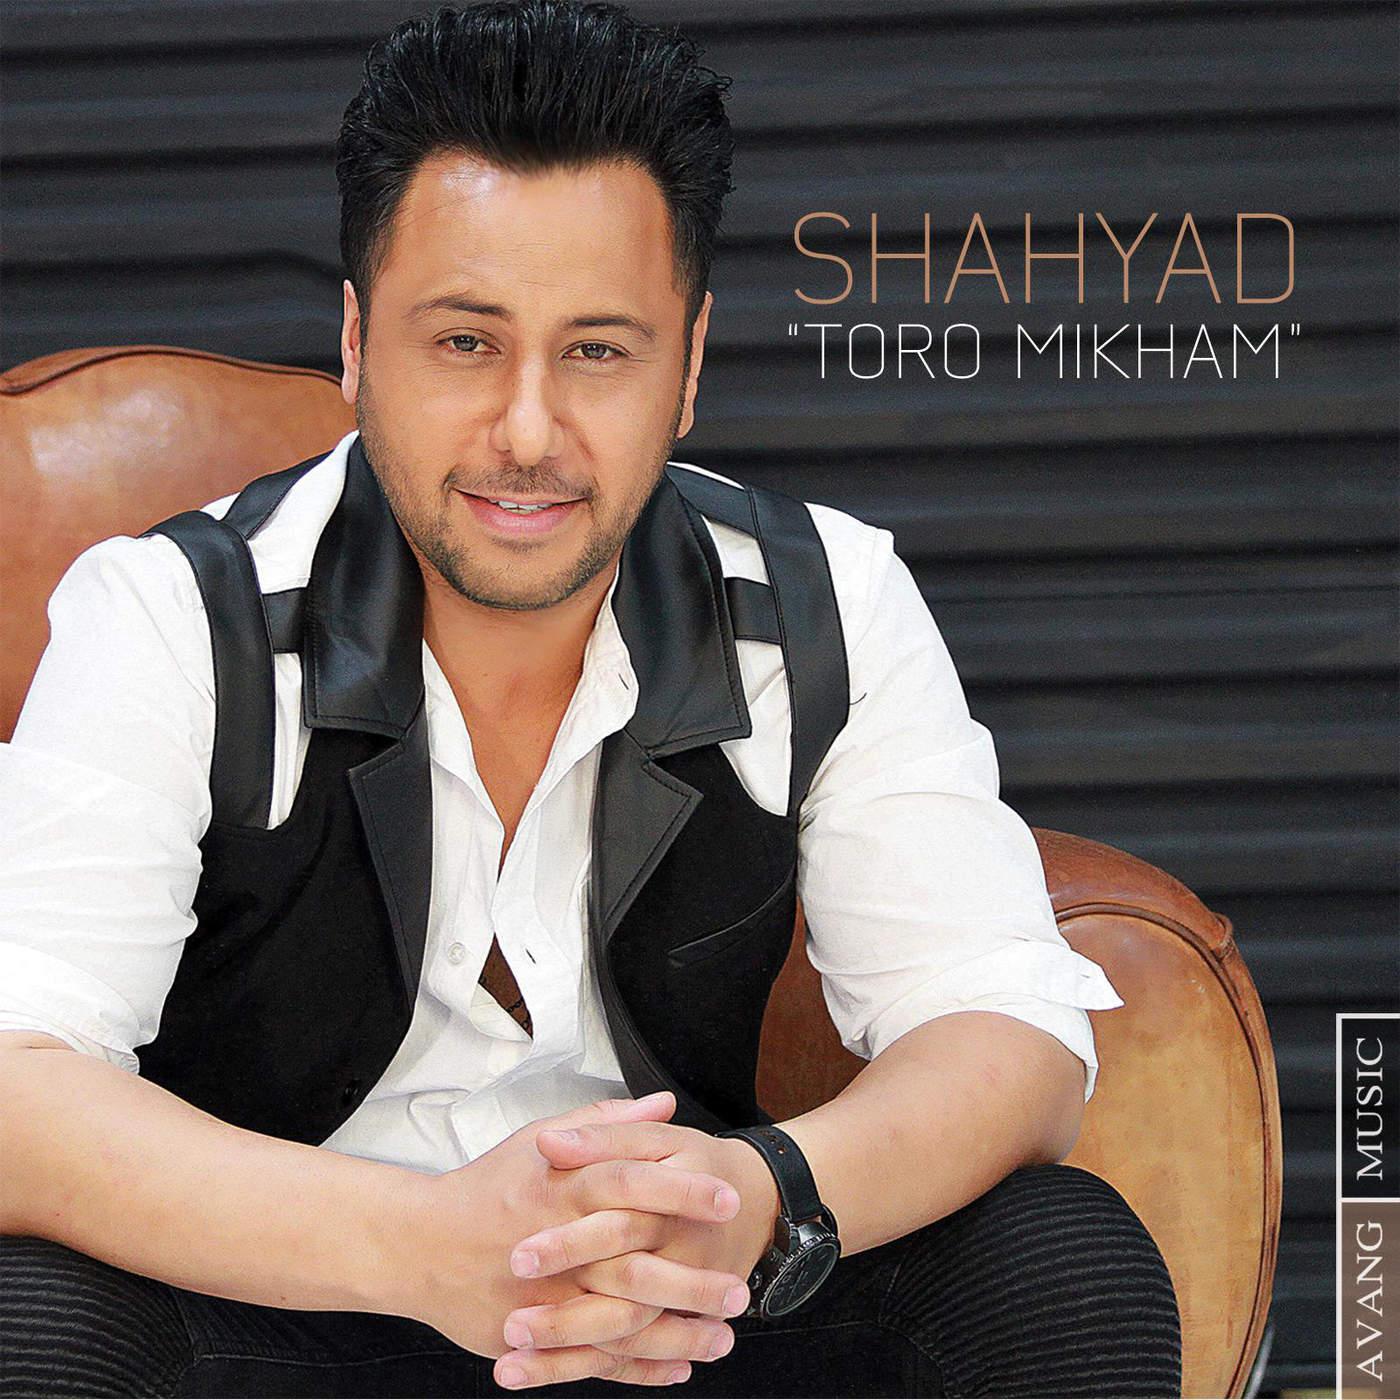 http://dl.tak3da.com/download/1394/07/Shahyad%20-%20Toro%20Mikham.jpg